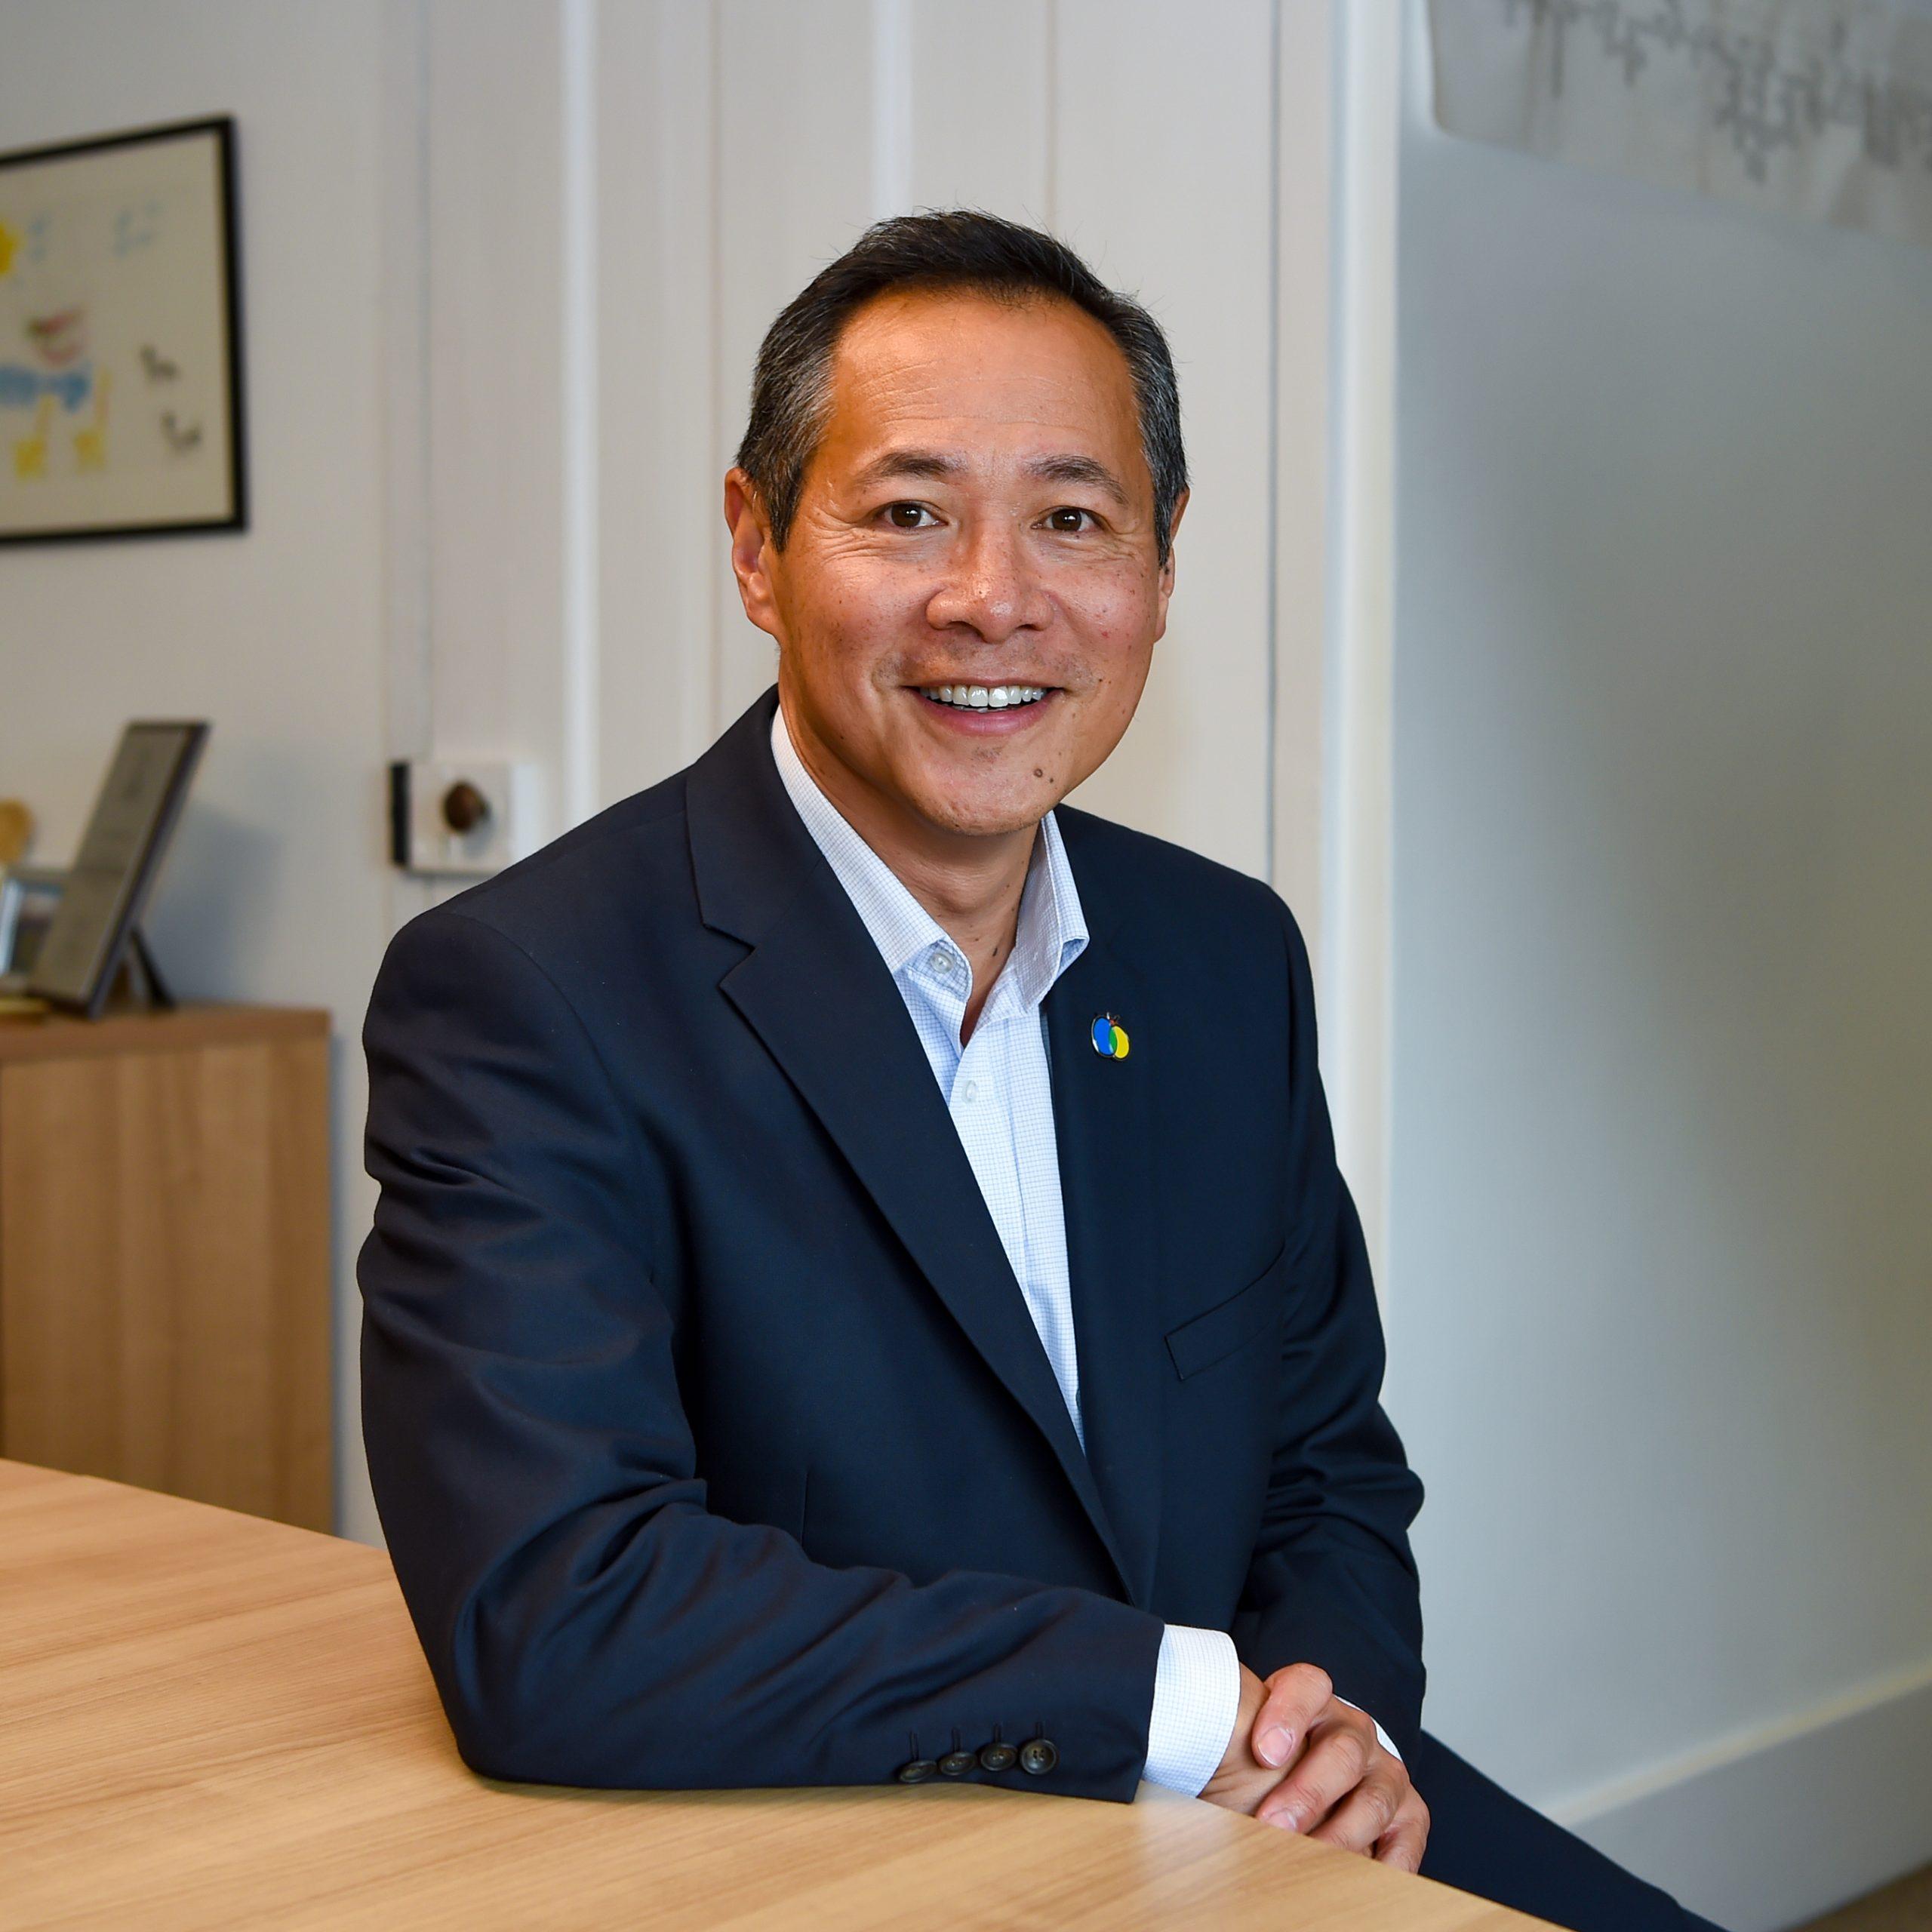 Dalton Leong on building high performing teams